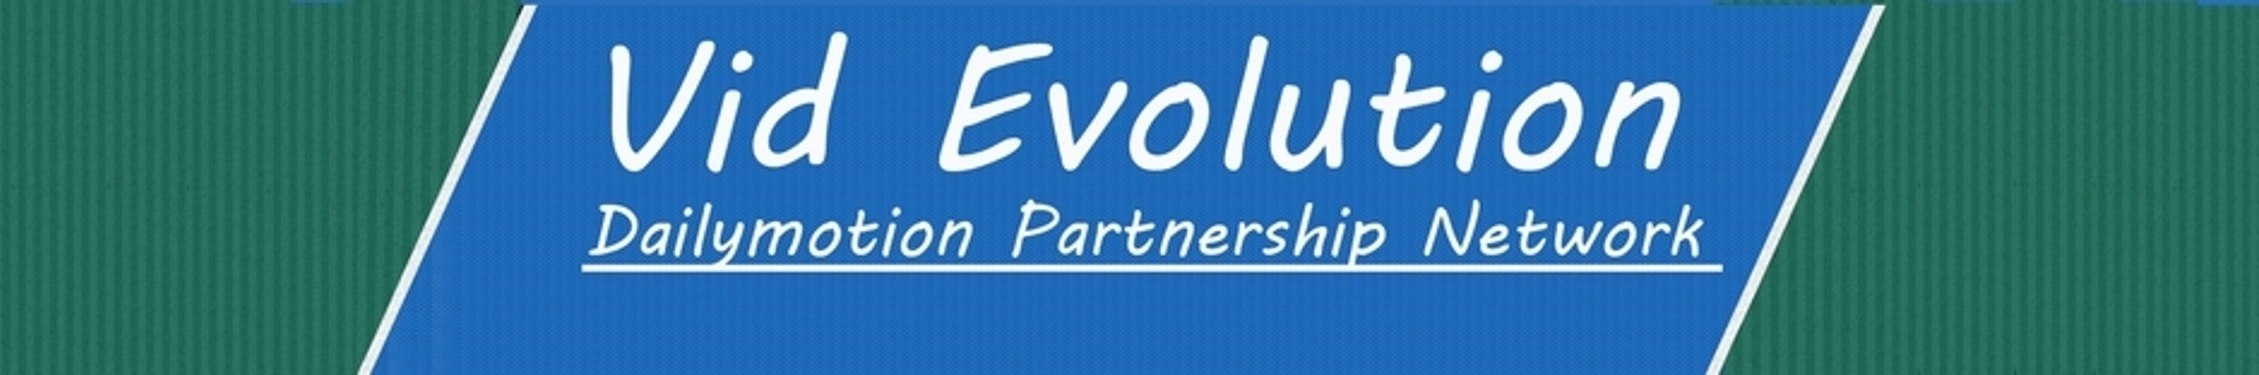 Vid Evolution MCN